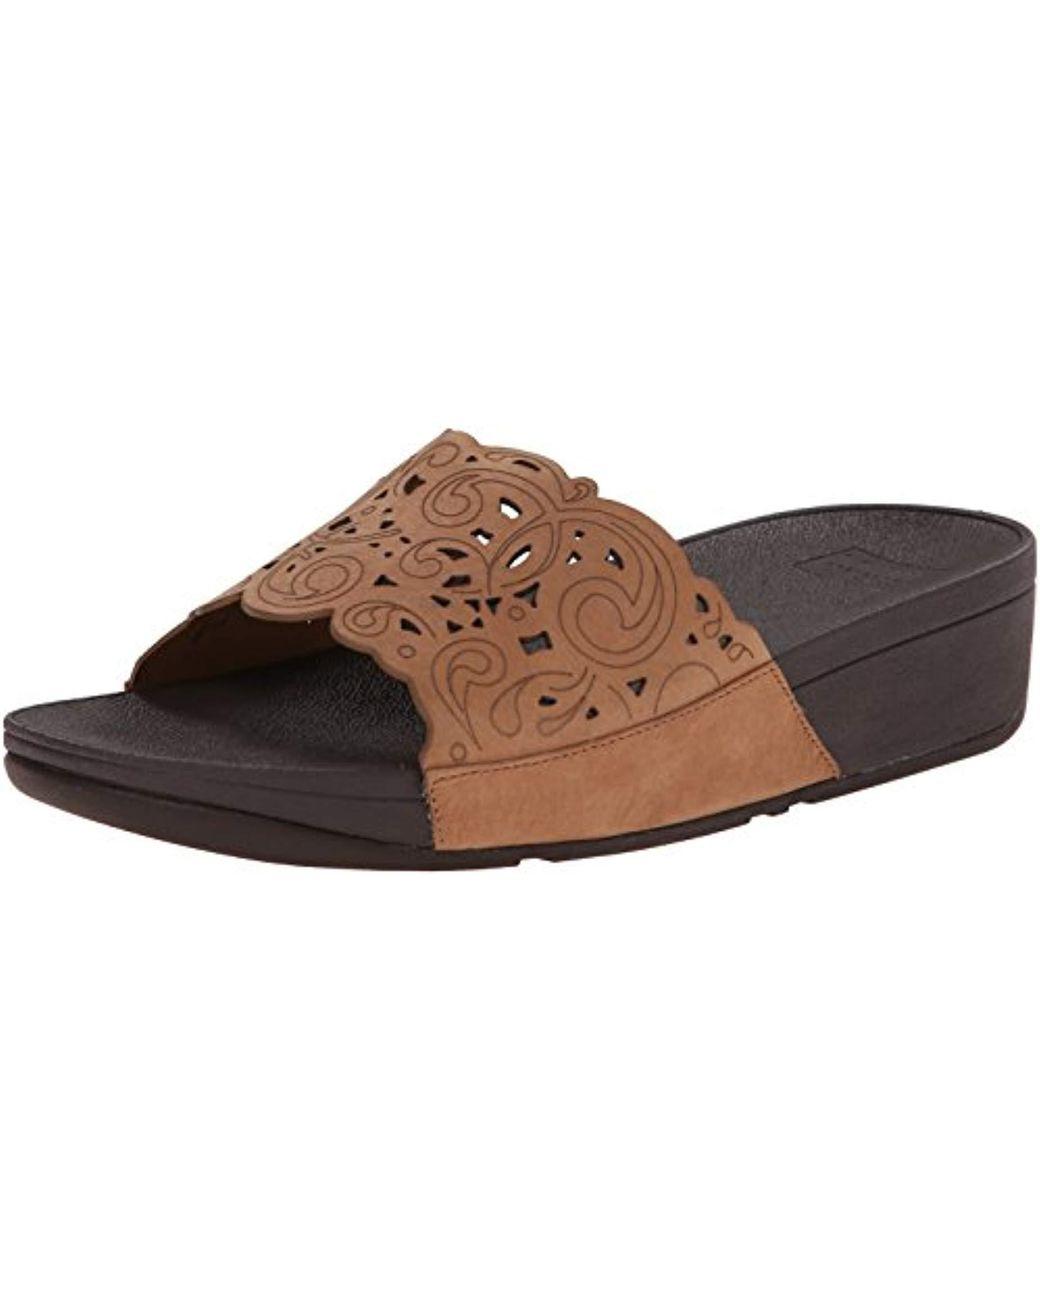 3f6978389 Lyst - Fitflop Flora Slide Sandal in Brown - Save 40%